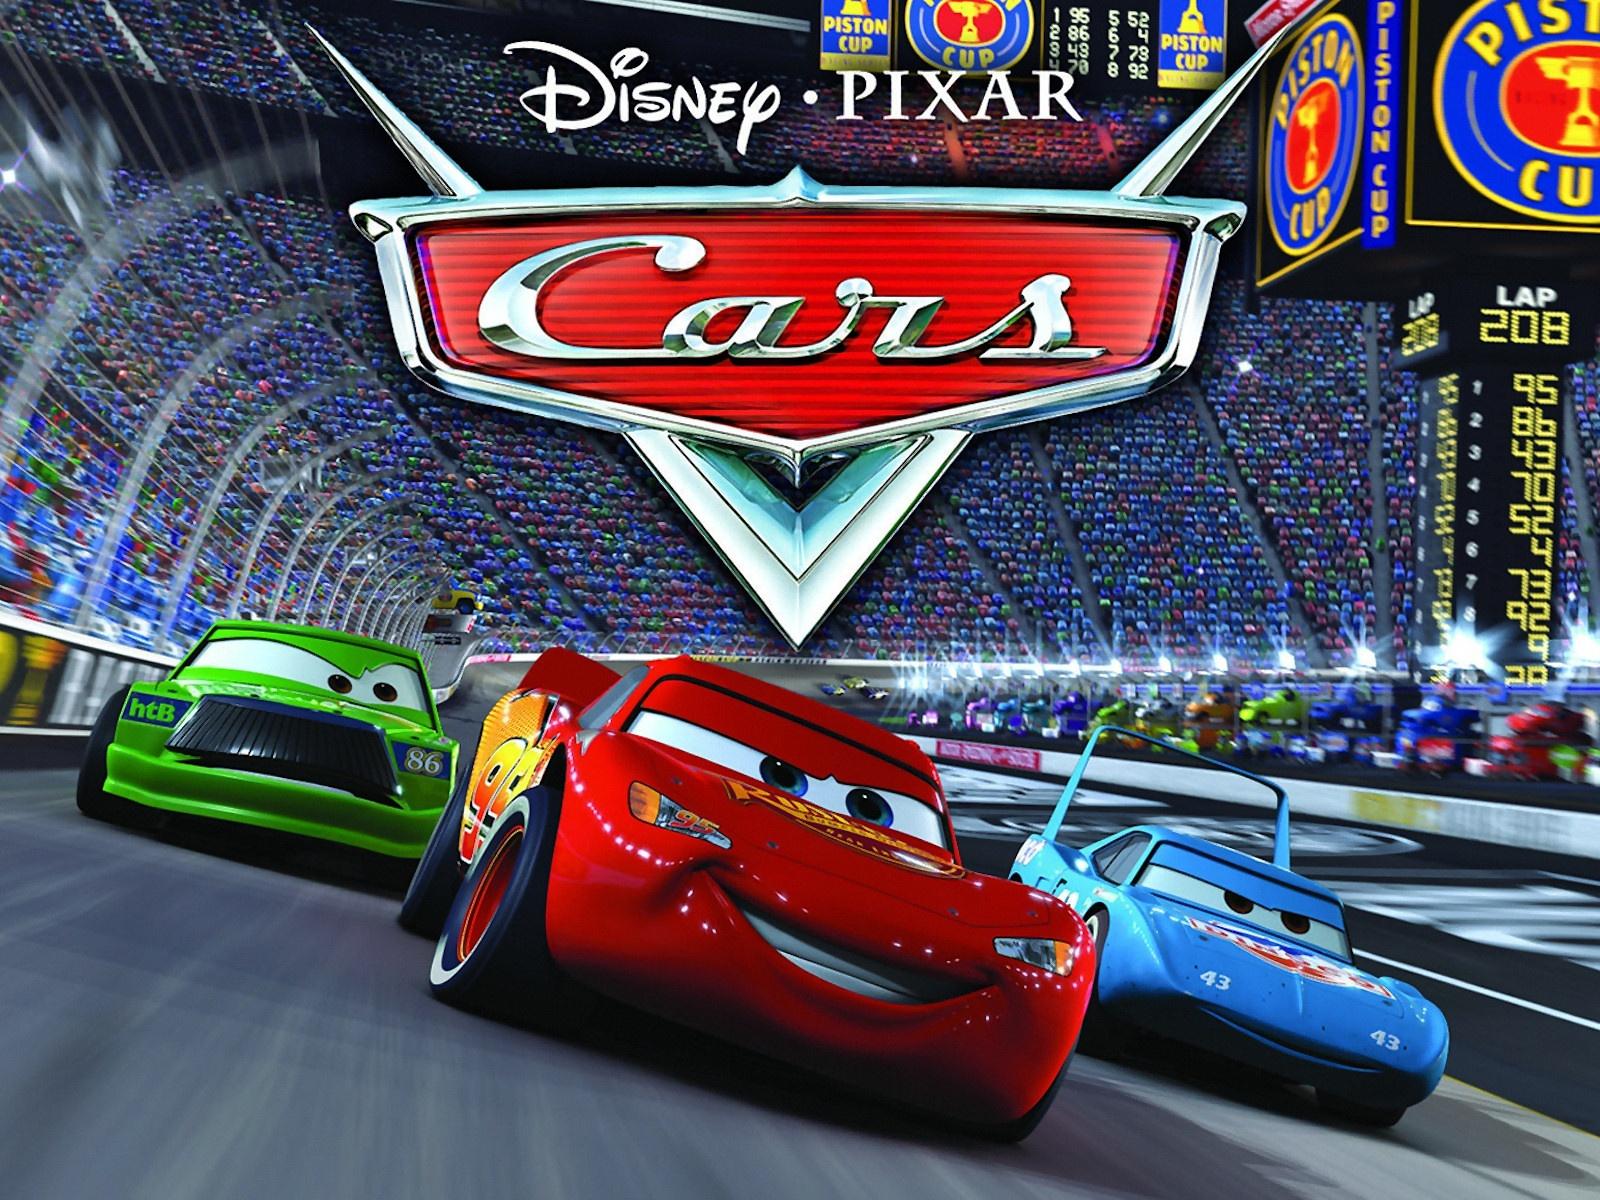 Disney Pixar Cars Wallpaper   1600x1200 1600x1200